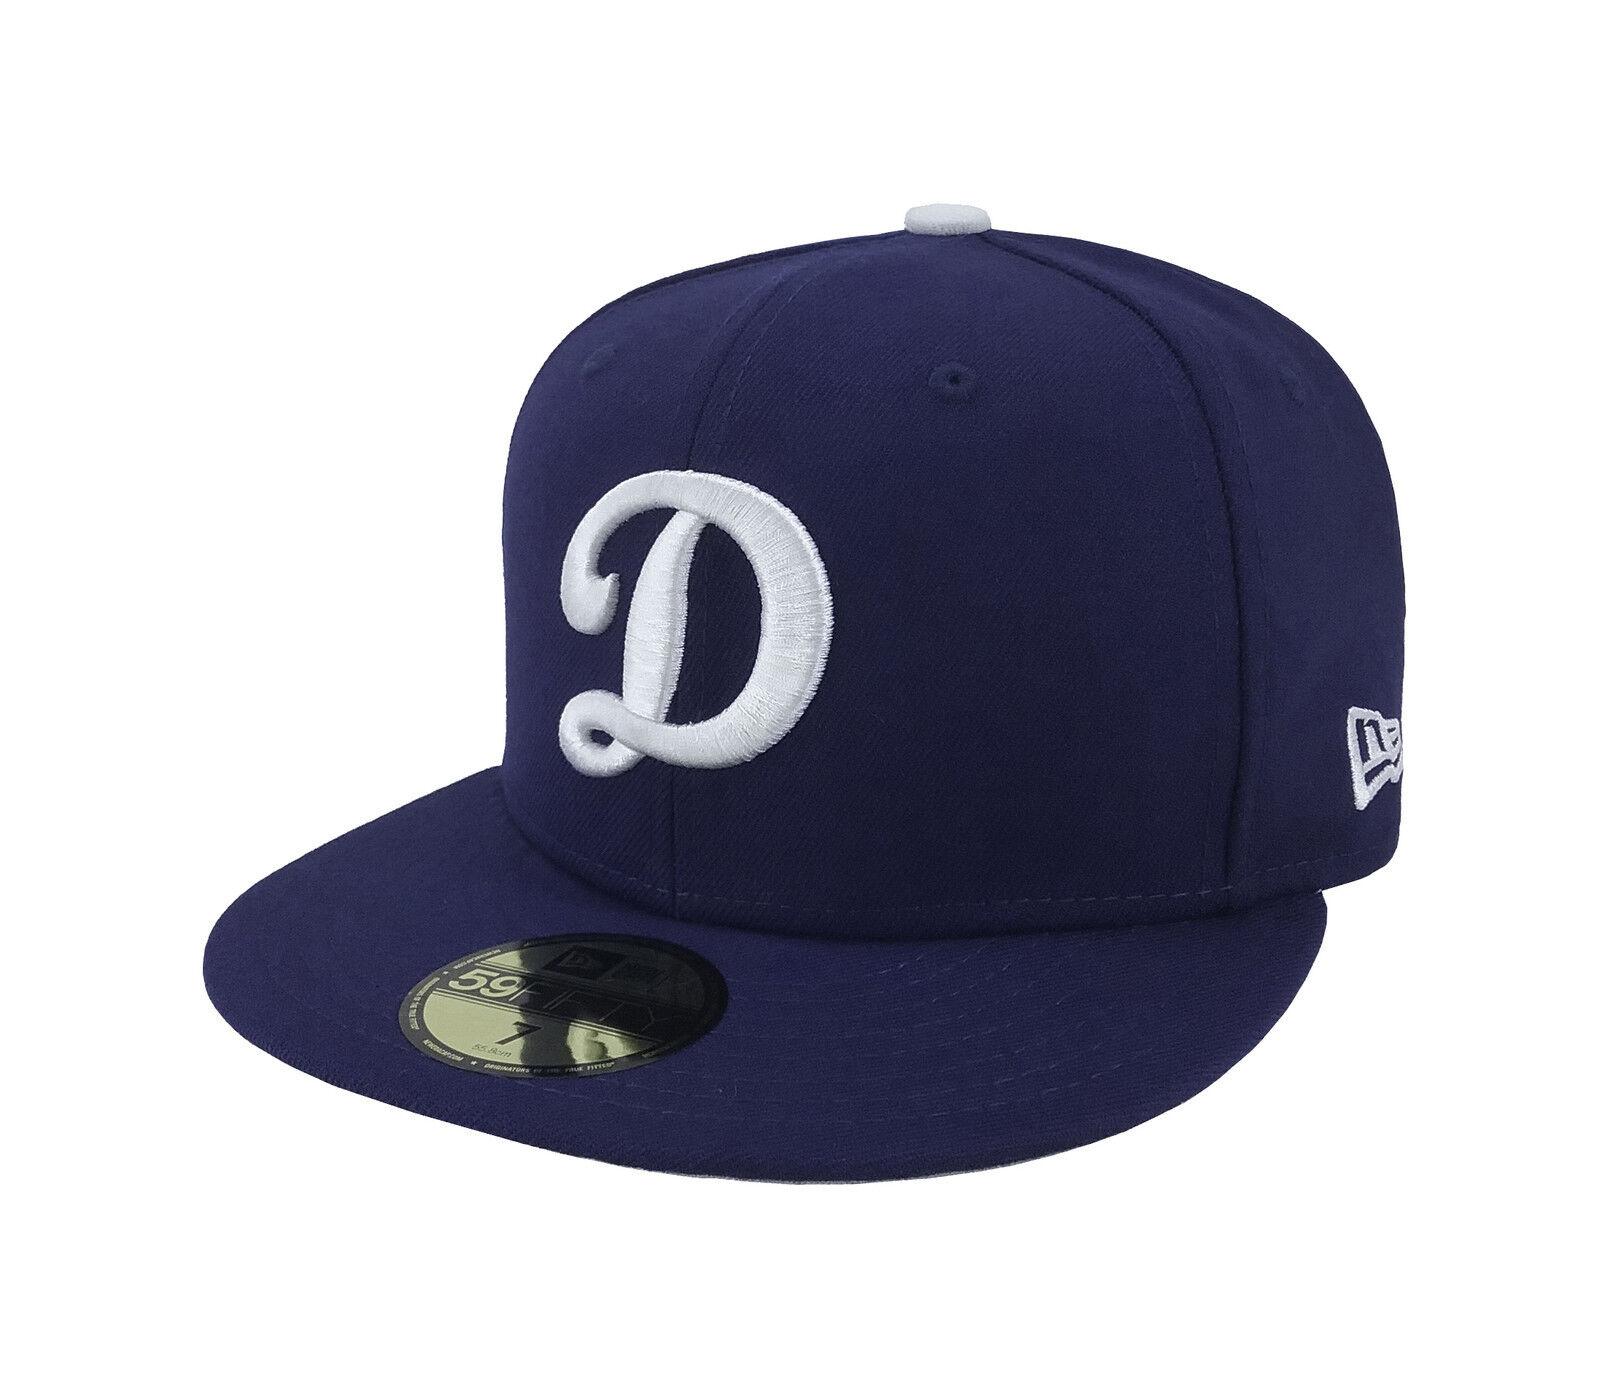 b1c4c5a3403 ... sale new era 59fifty baseball mlb cap los angeles dodgers baseball  59fifty dark royal blue d